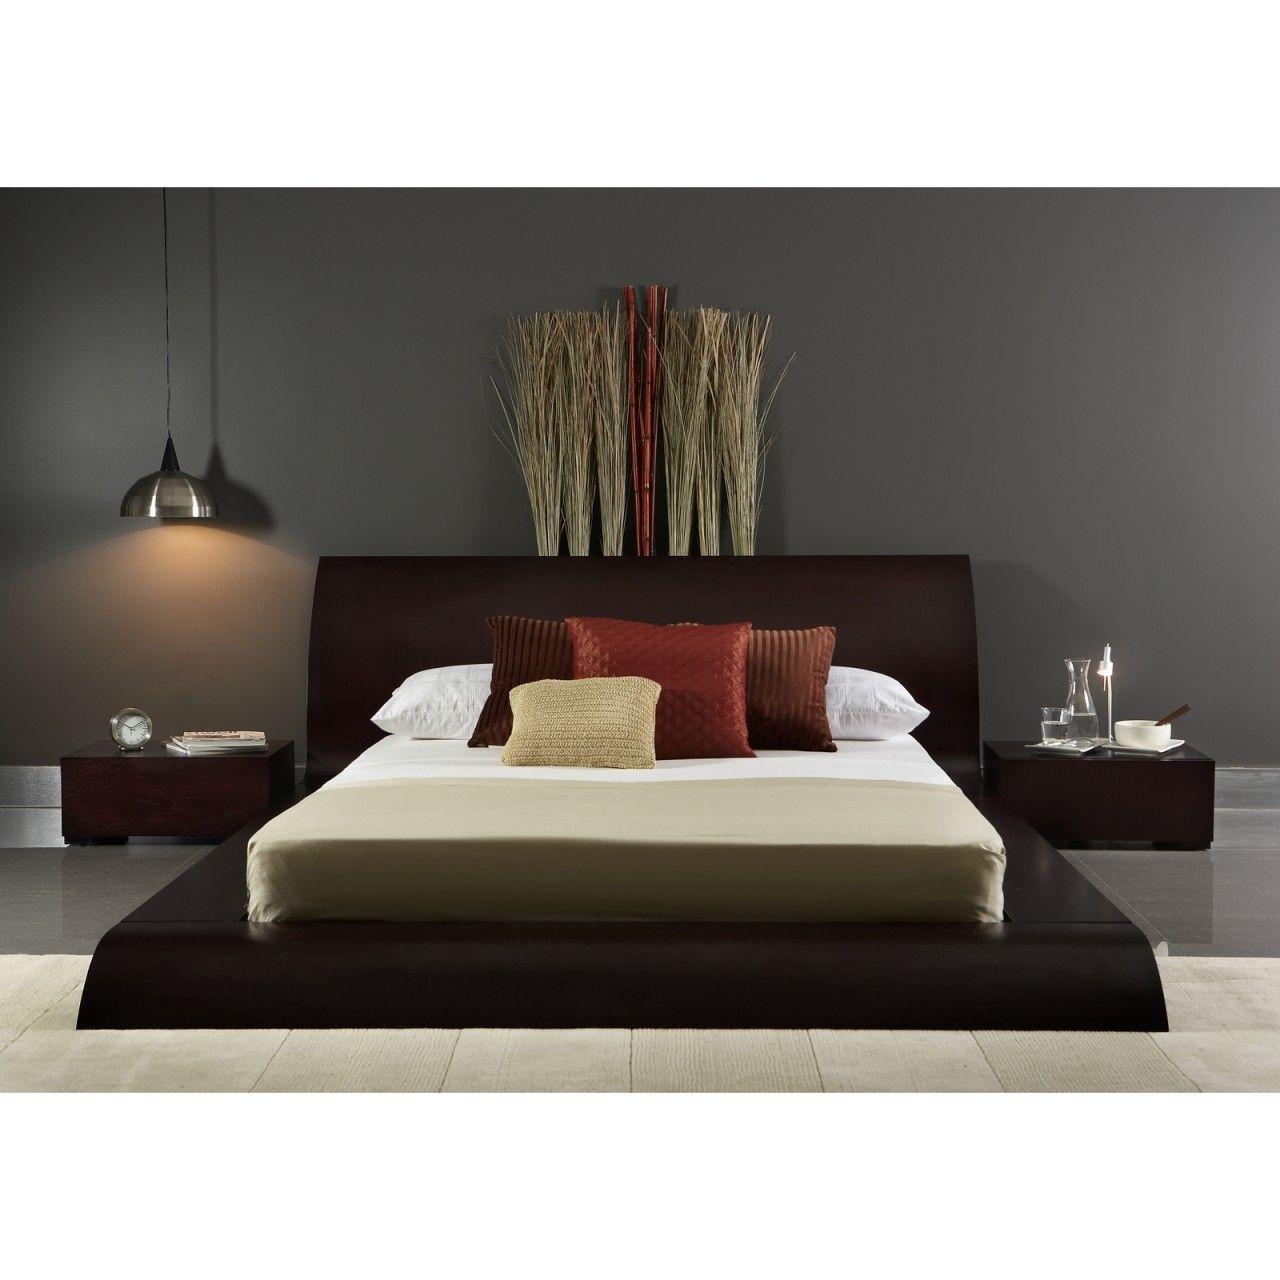 Modern Platform Bed Store - Waverly Platform Bed - Queen (Wenge ...